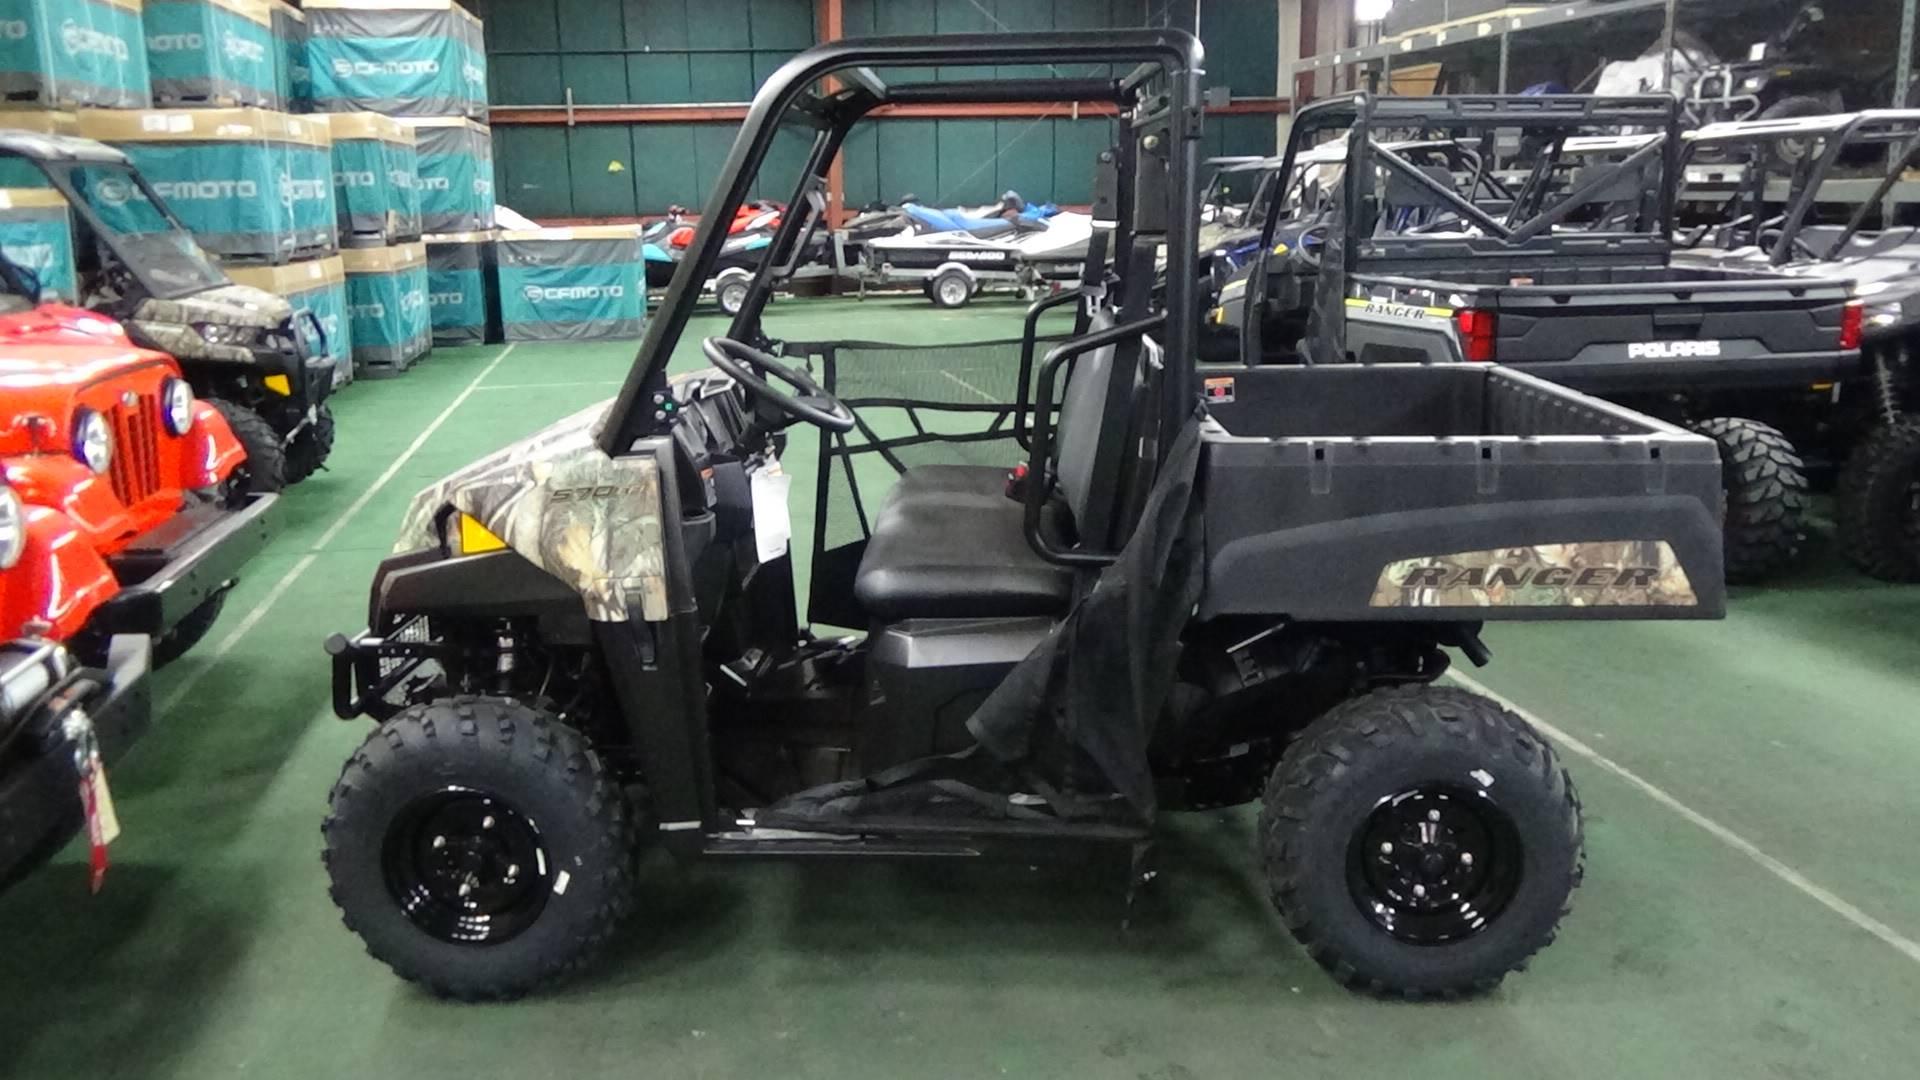 2019 Polaris Ranger 570 Polaris Pursuit Camo for sale 9755